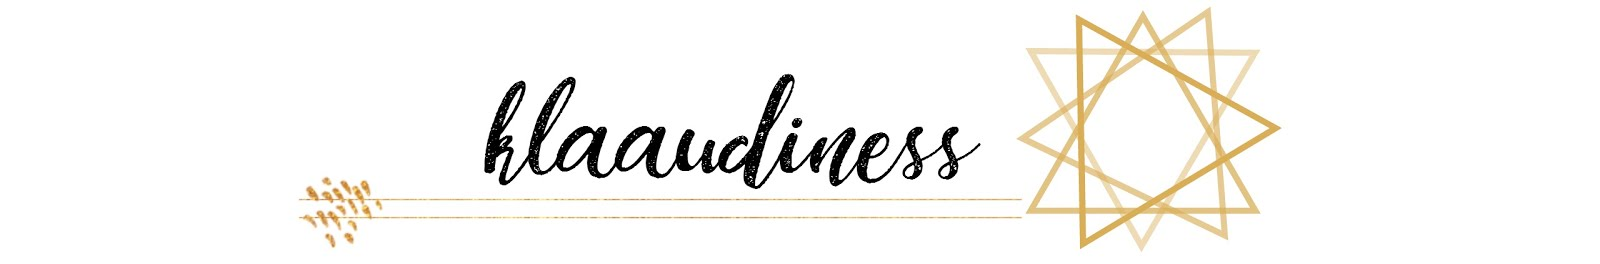 KLAAUDINESS